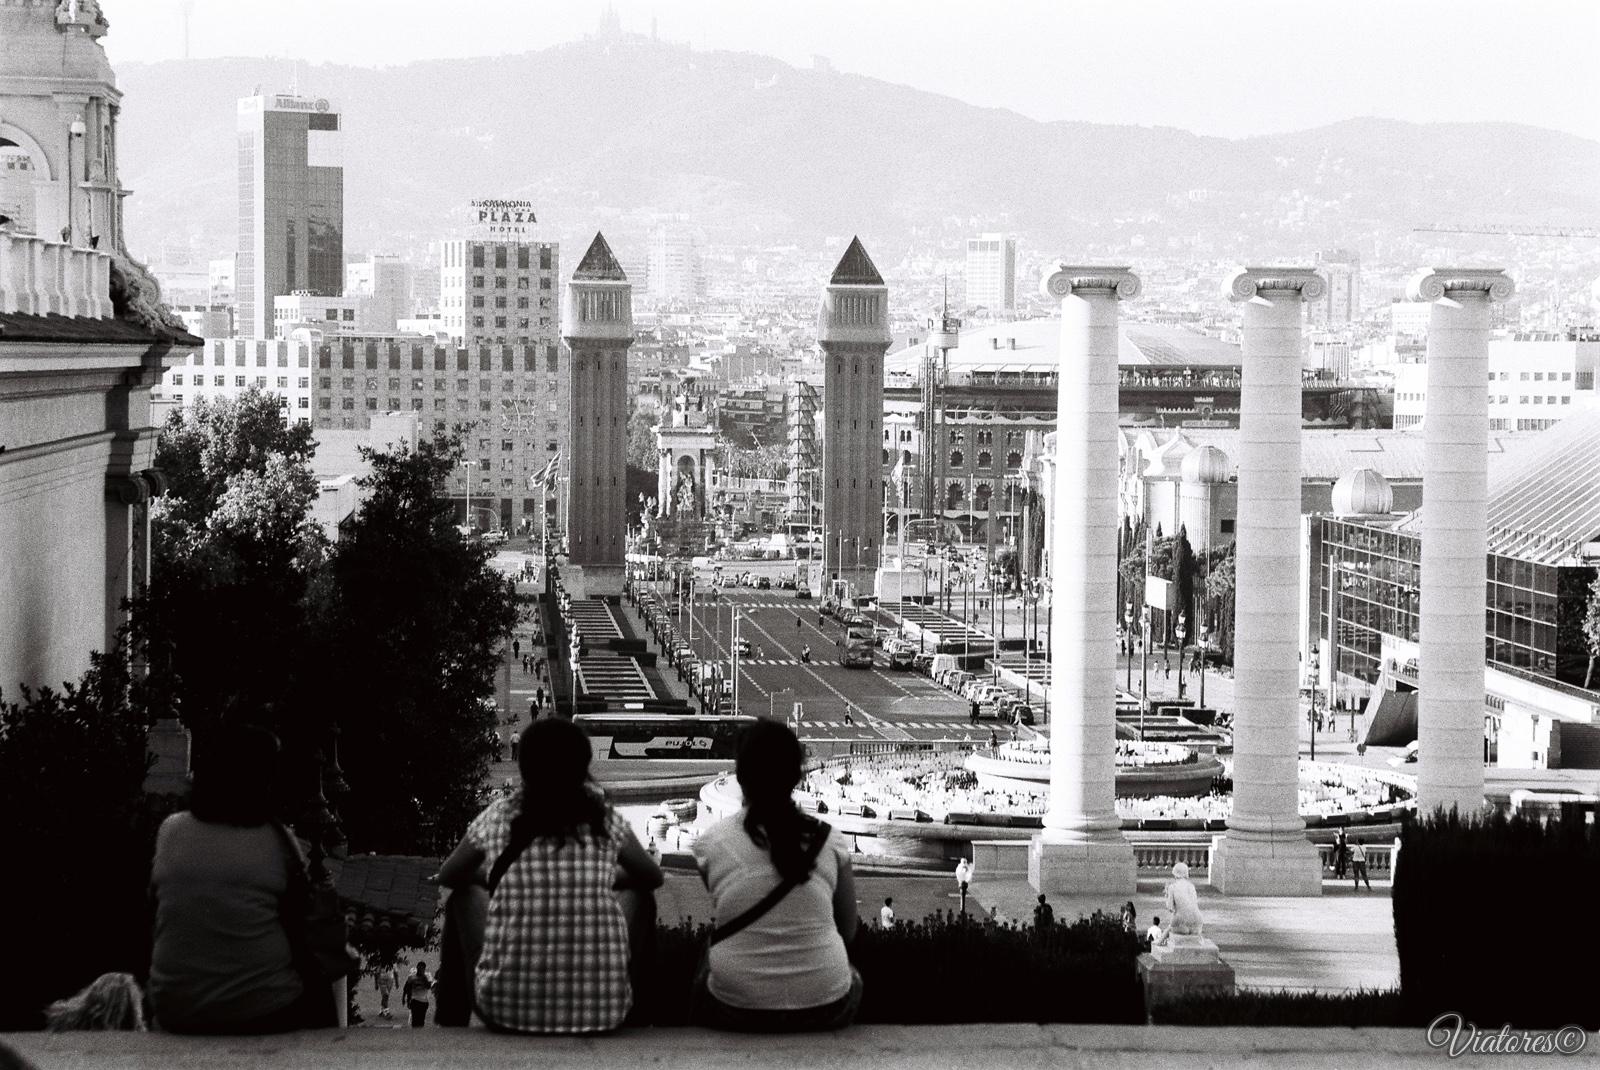 Placa Espanya. Barcelona. Spain